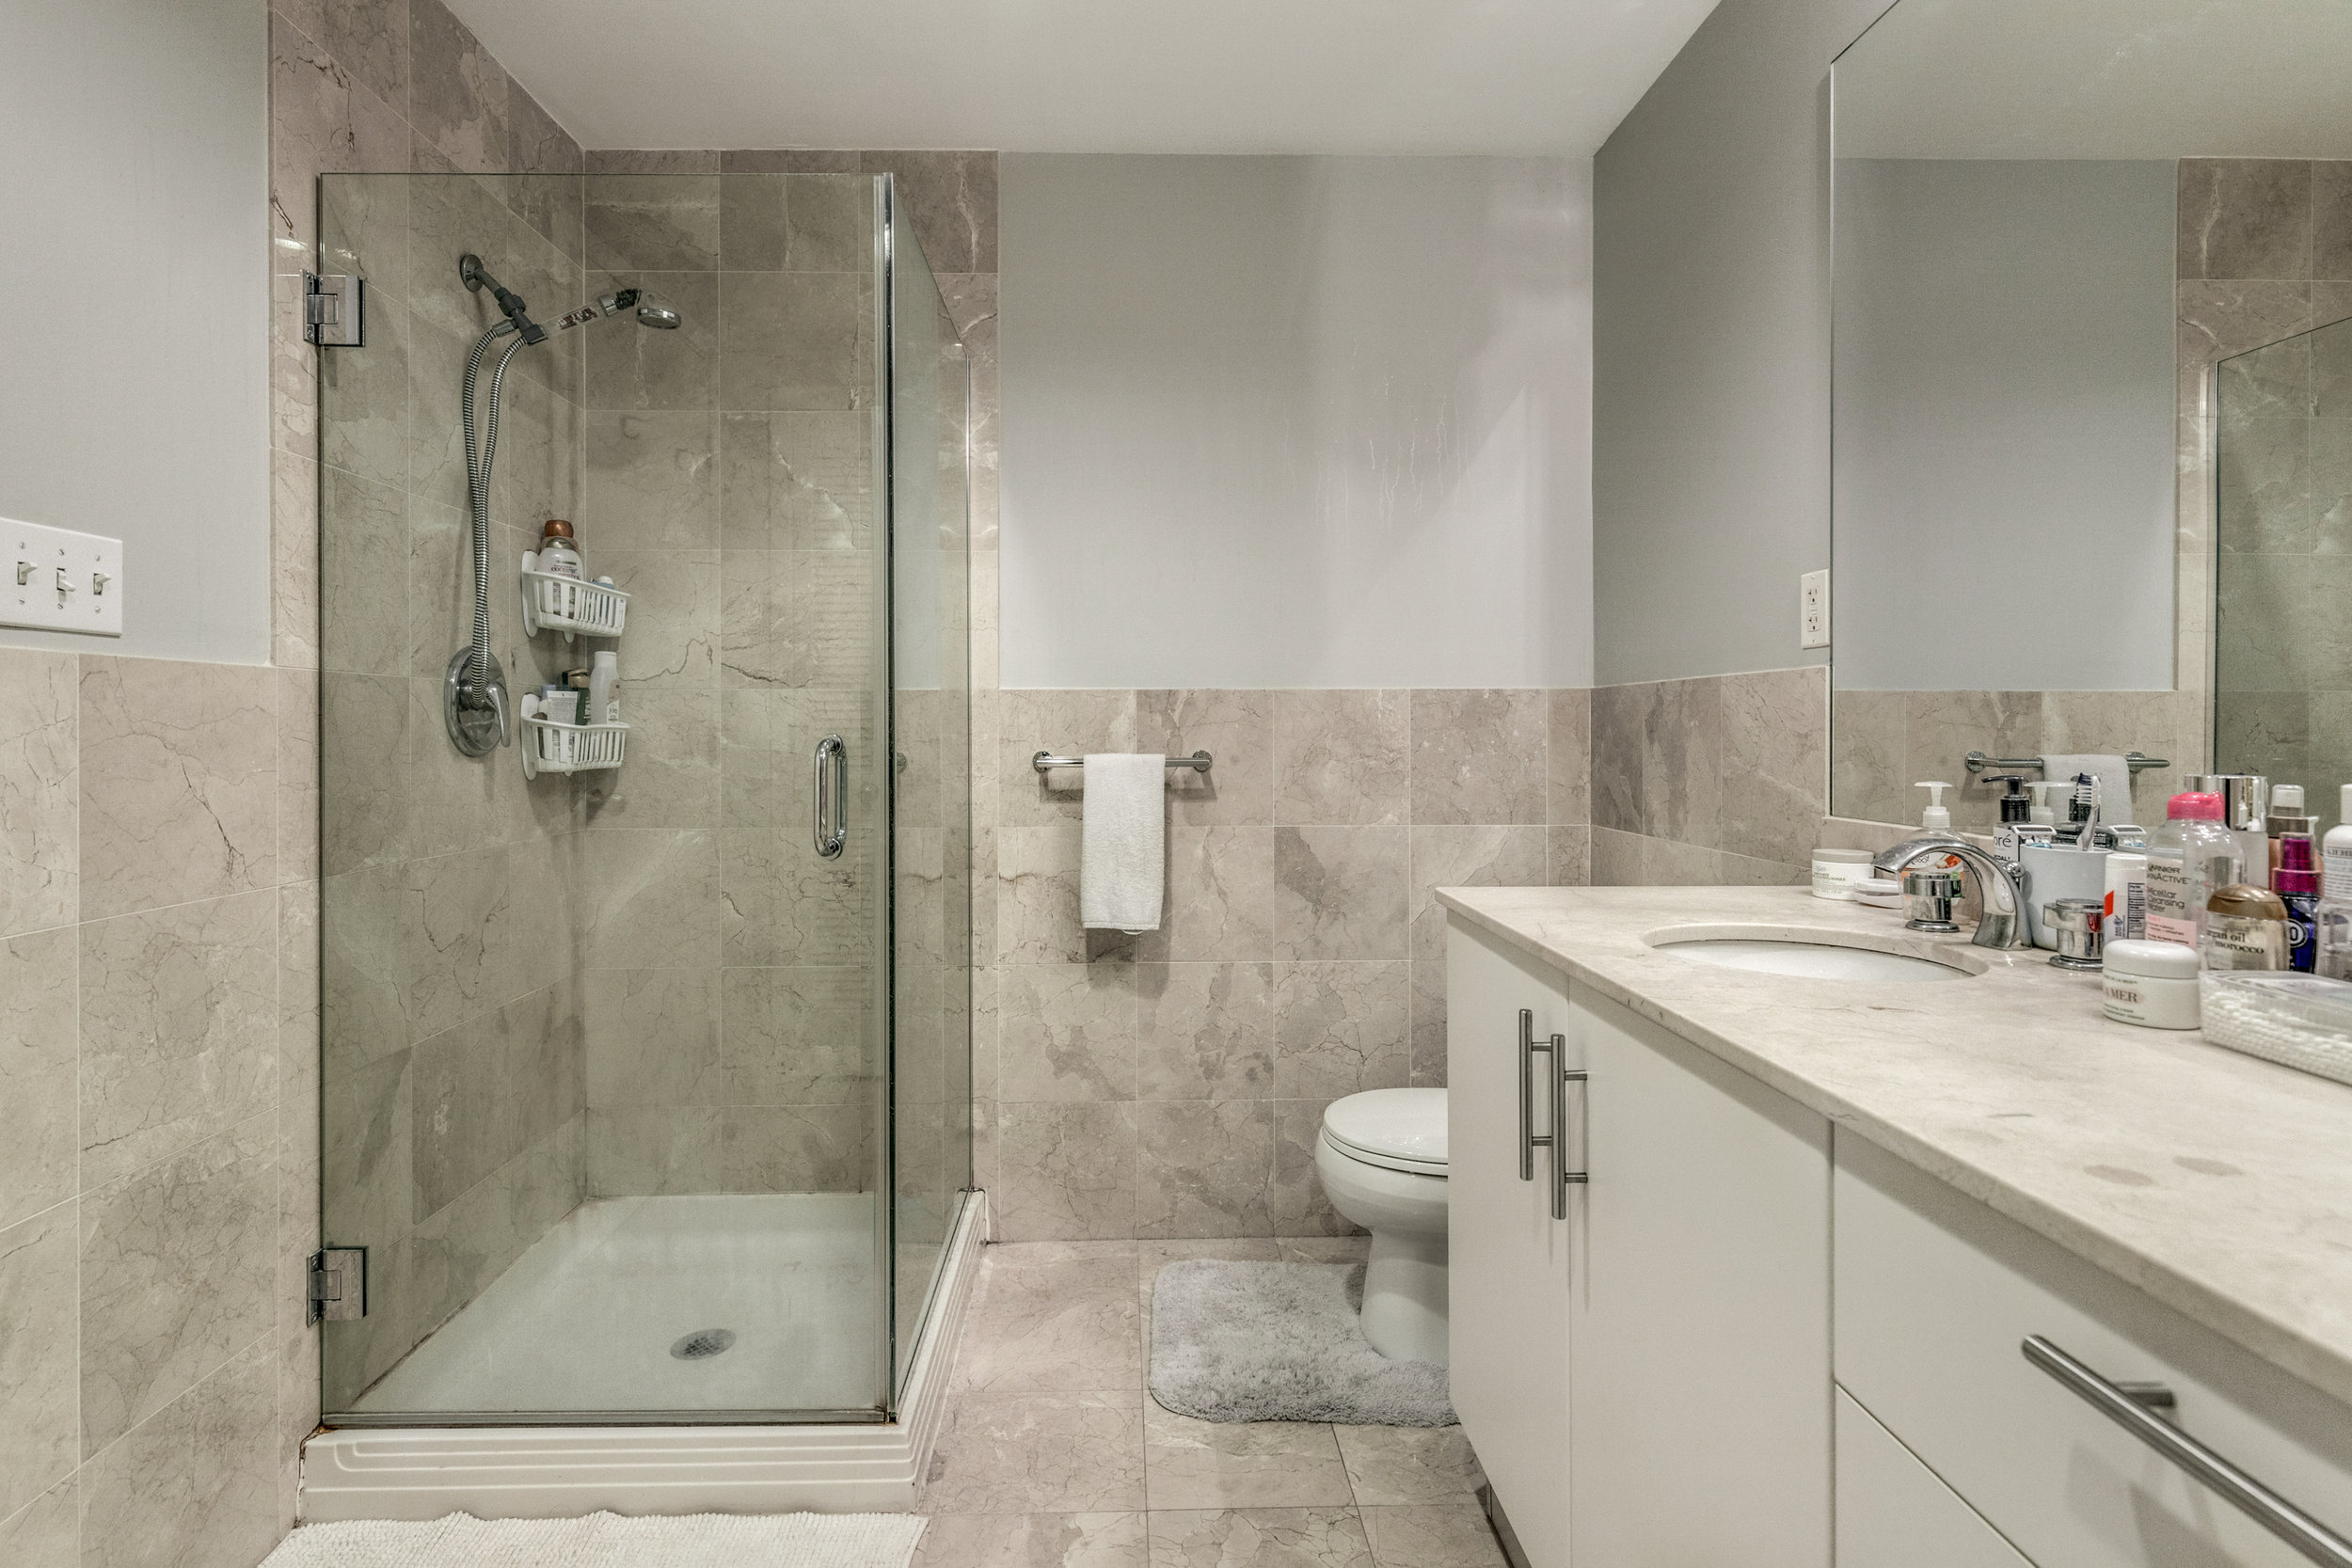 19_Bathroom.jpg